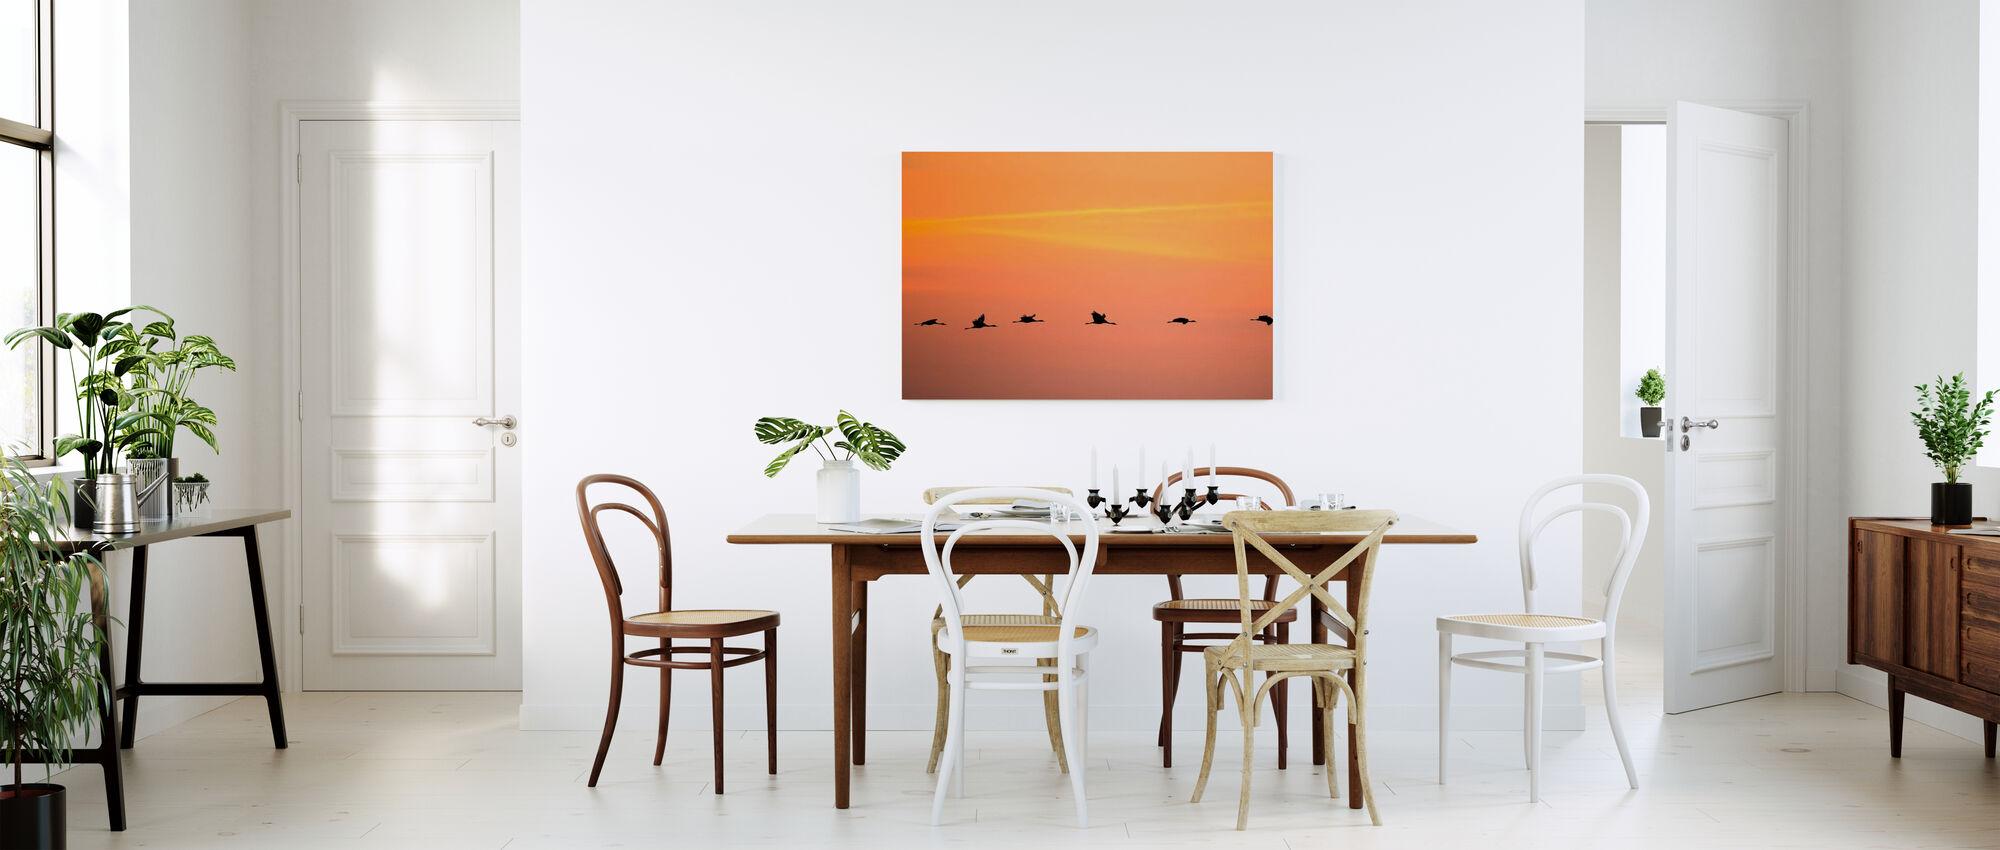 Krane in Sonnenaufgang - Leinwandbild - Küchen